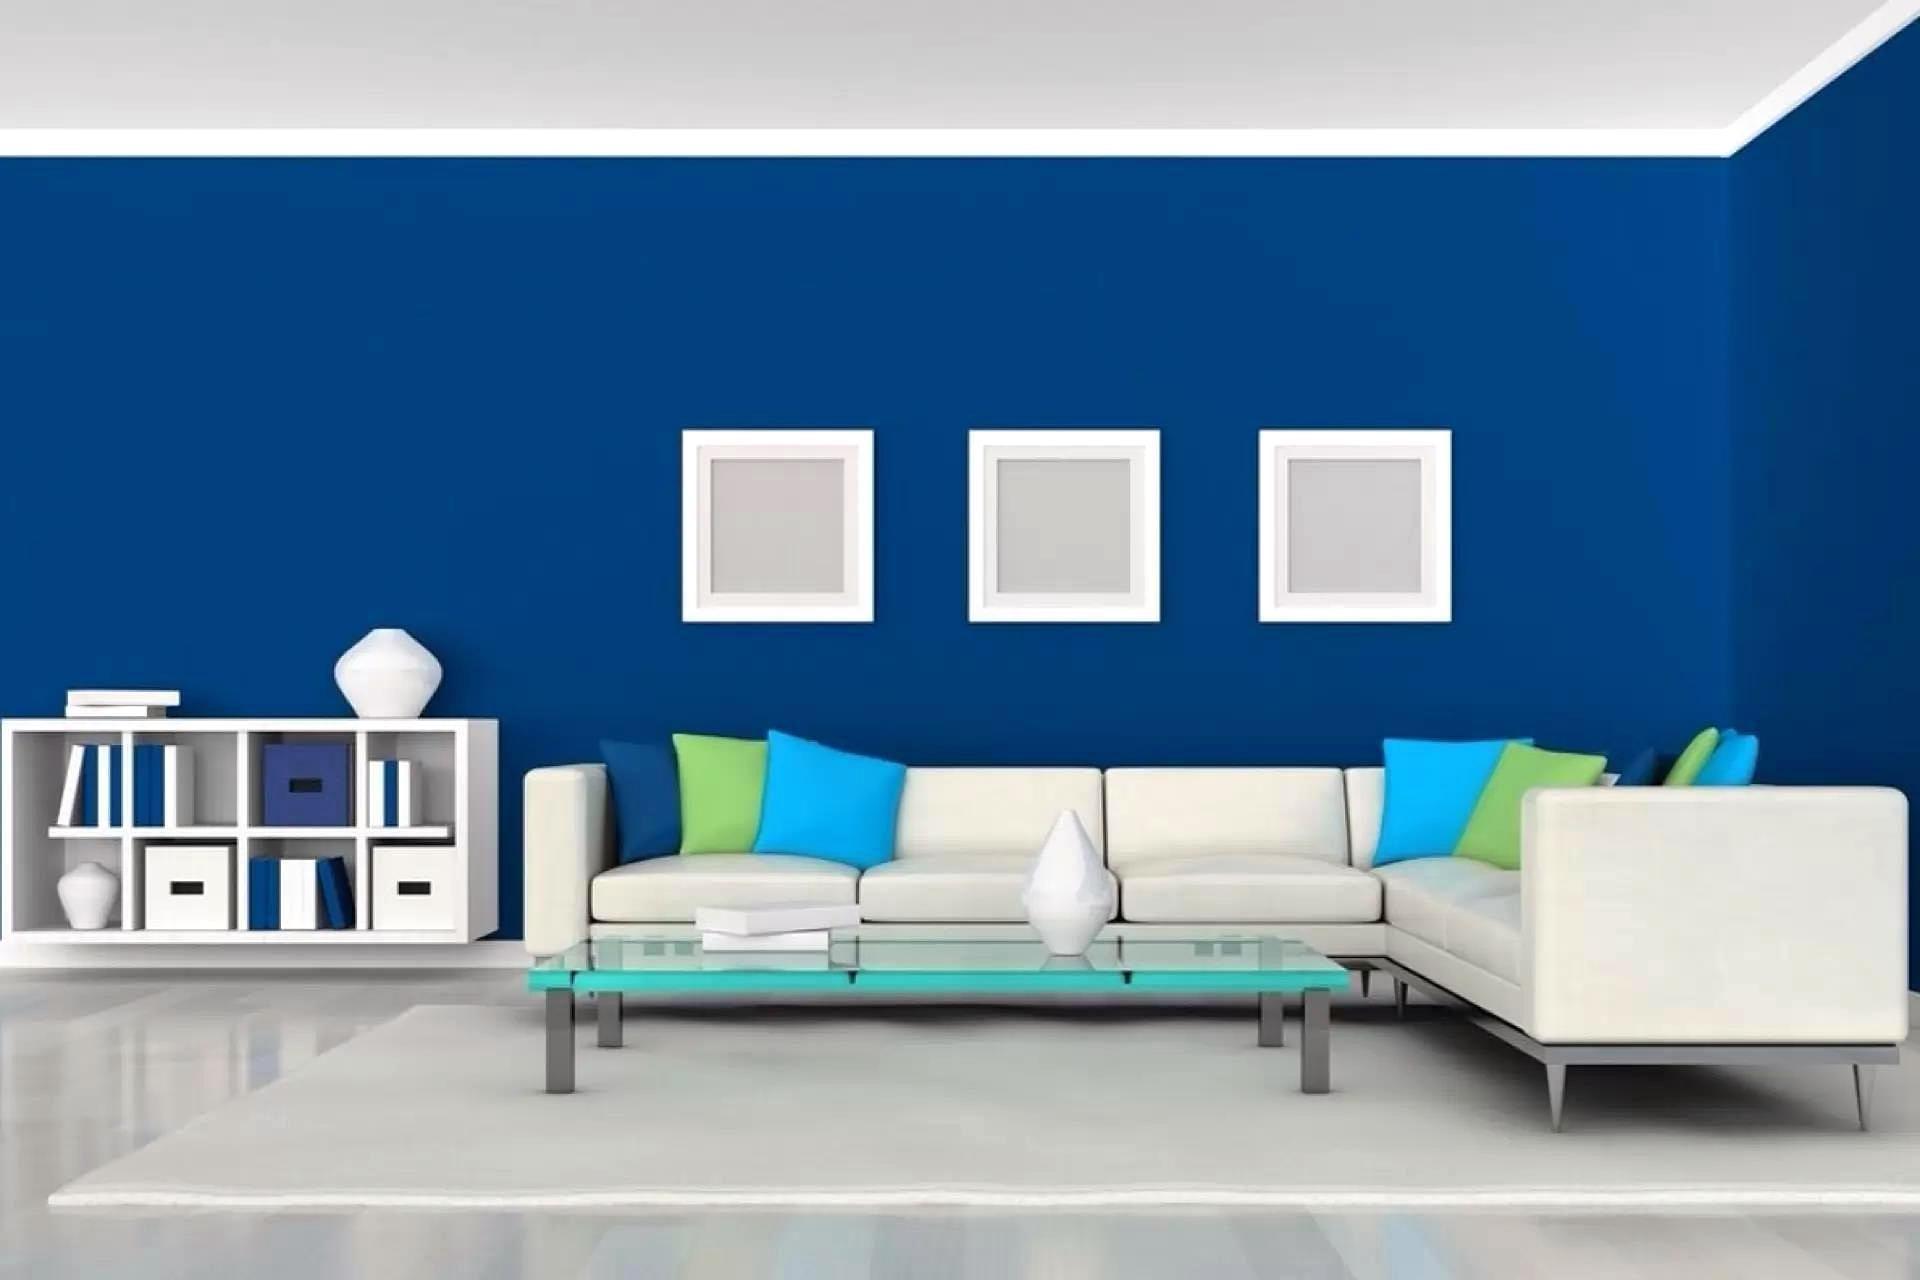 Desain Ruang Tamu Cream Living Room Color Schemes Living Room Color Room Wall Colors Home living room color schemes png